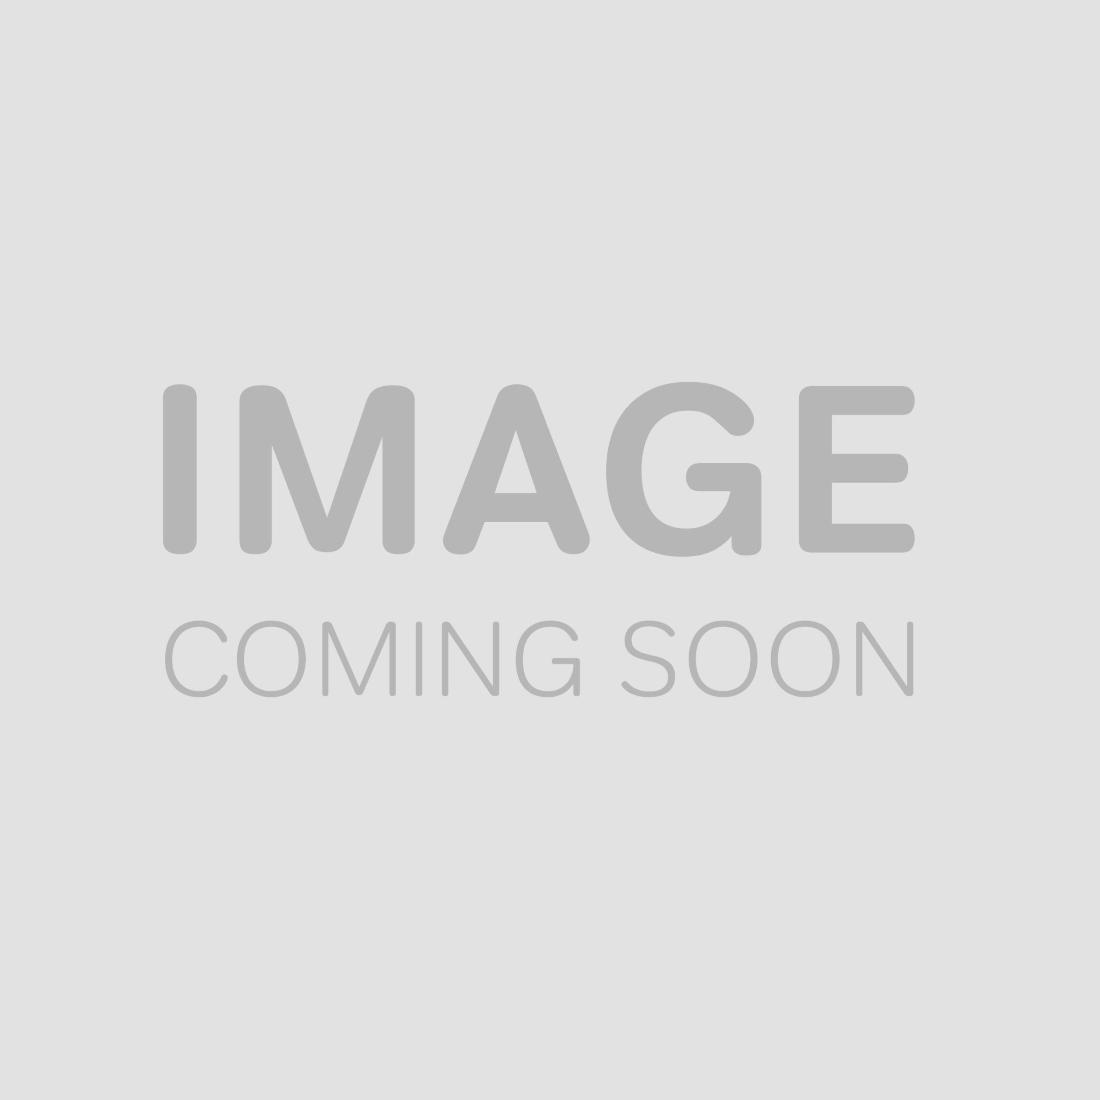 Padded Sling - Mesh - Keyhole Clip Fitting - Large